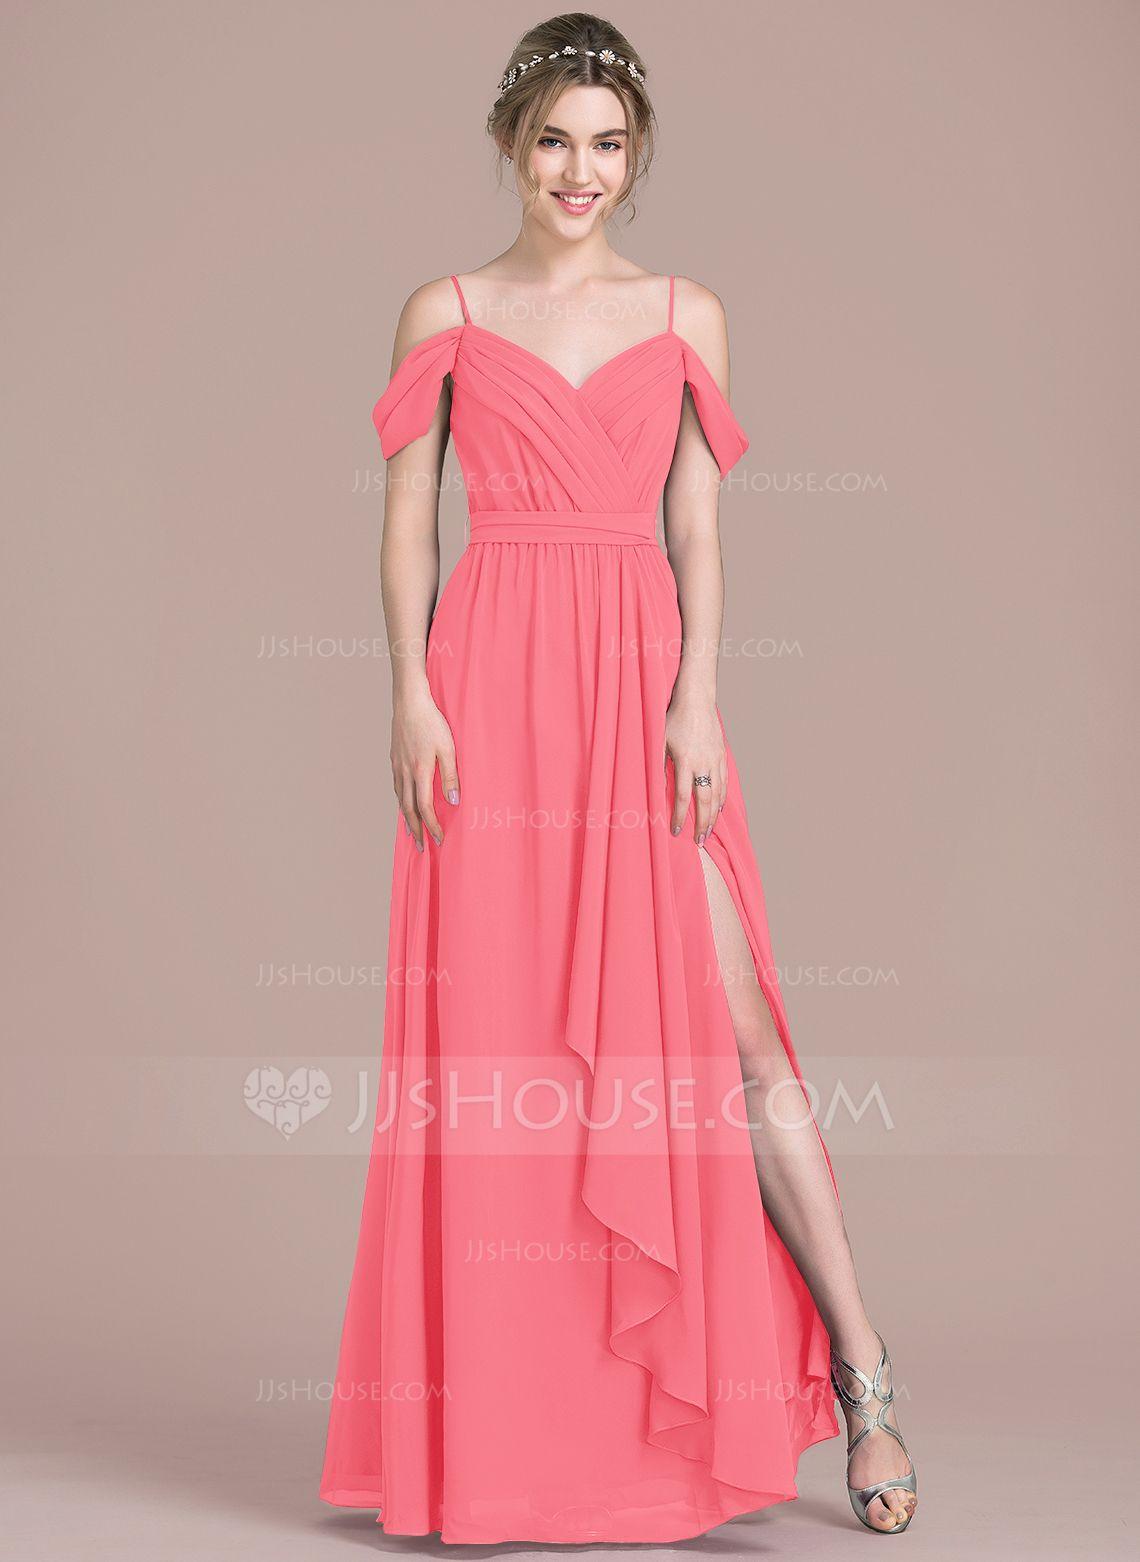 Moderno Prom Vestidos Jjshouse Colección - Colección de Vestidos de ...